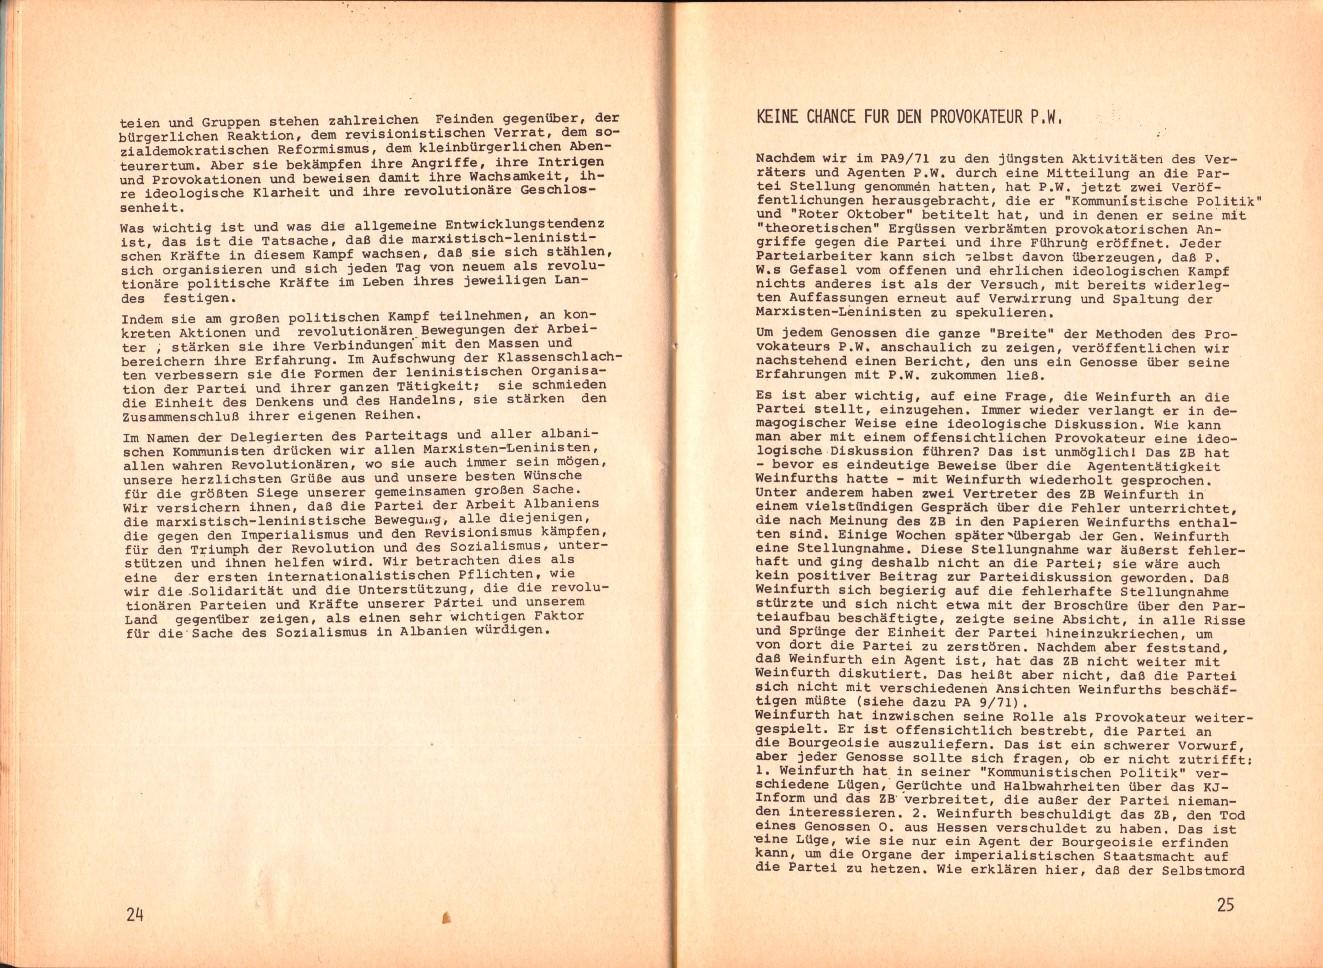 ZB_Parteiarbeiter_1971_10_14